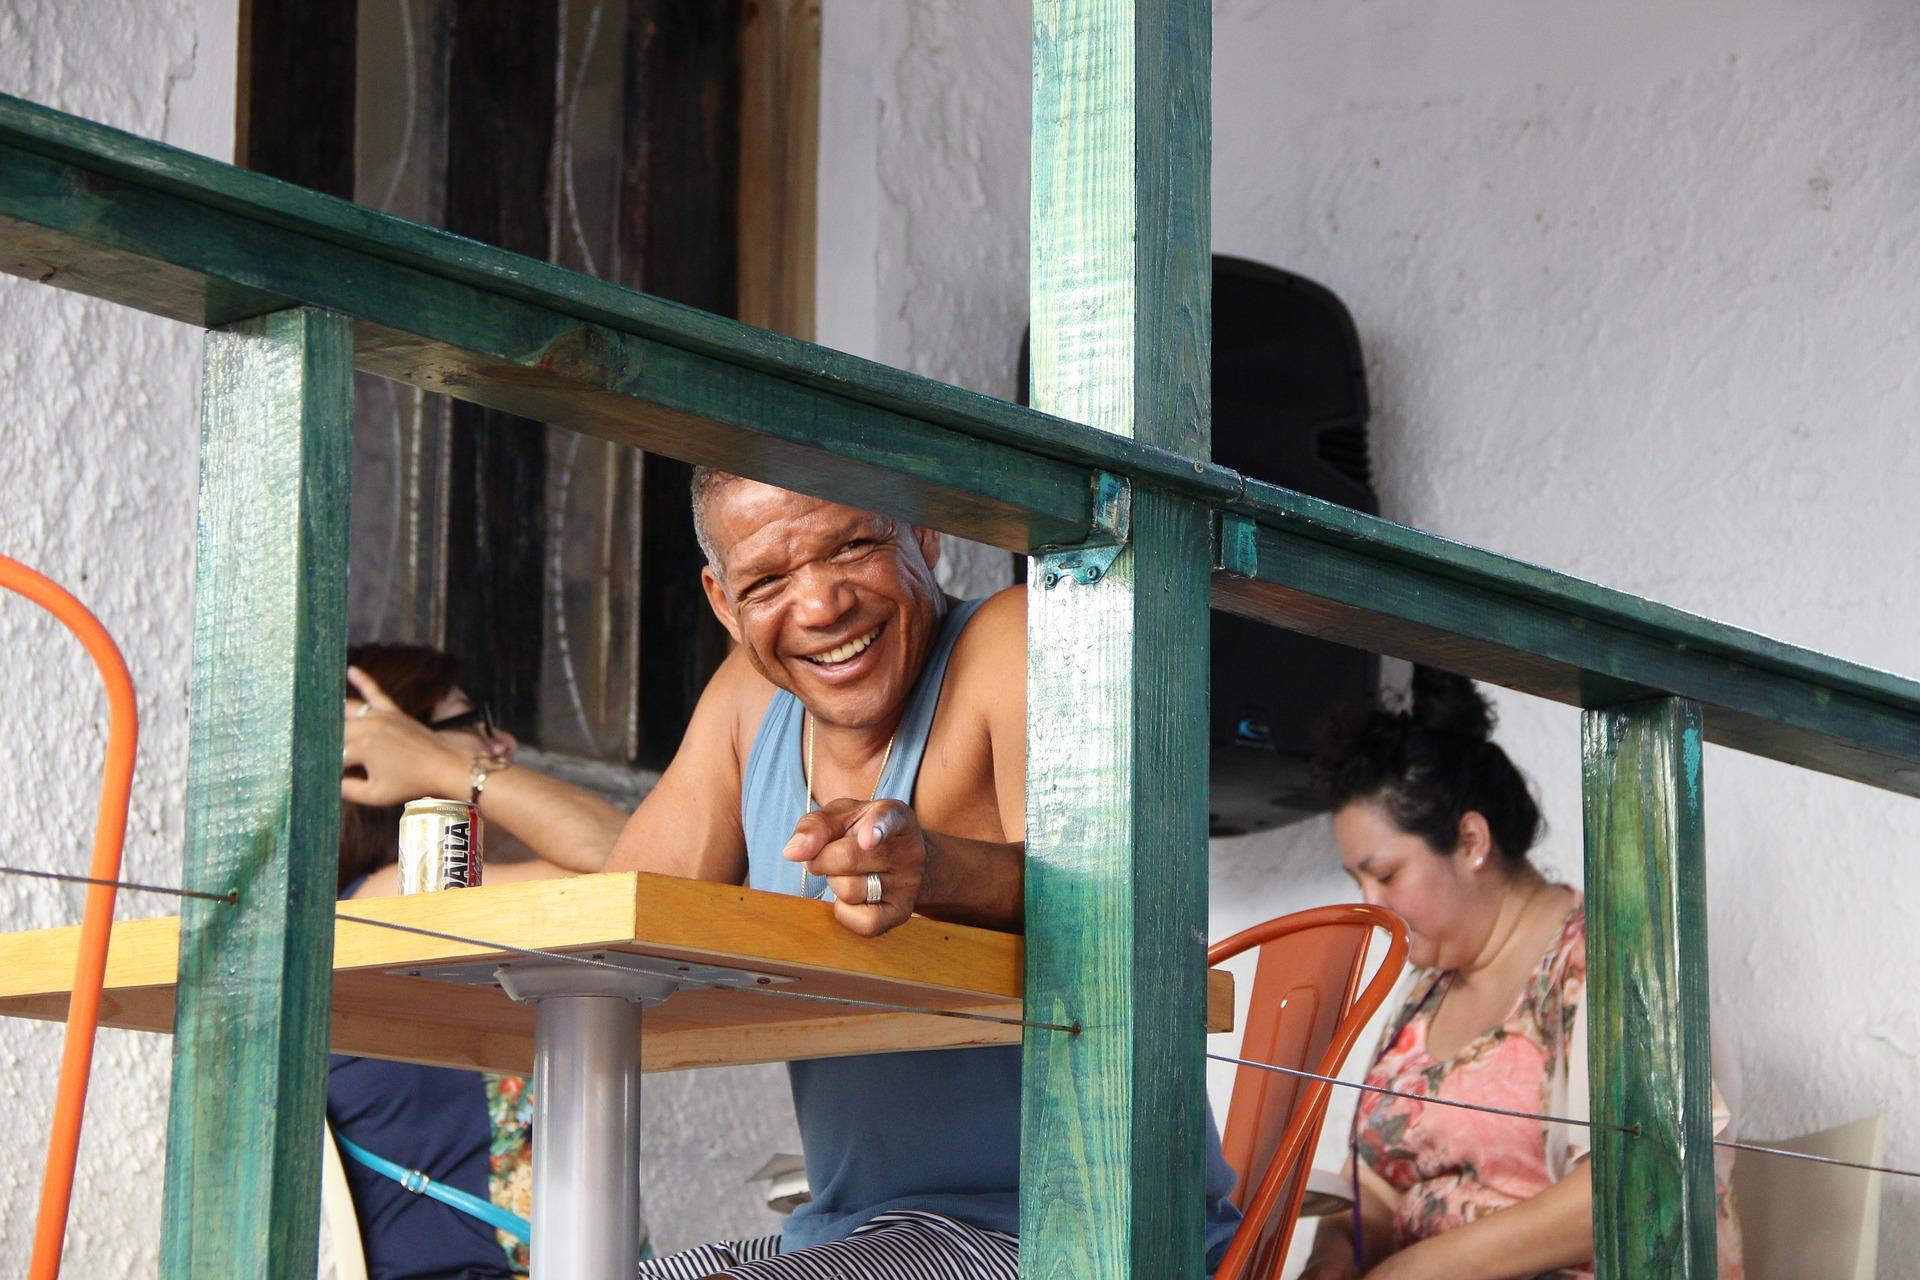 PuertoRico_Cafe.jpg